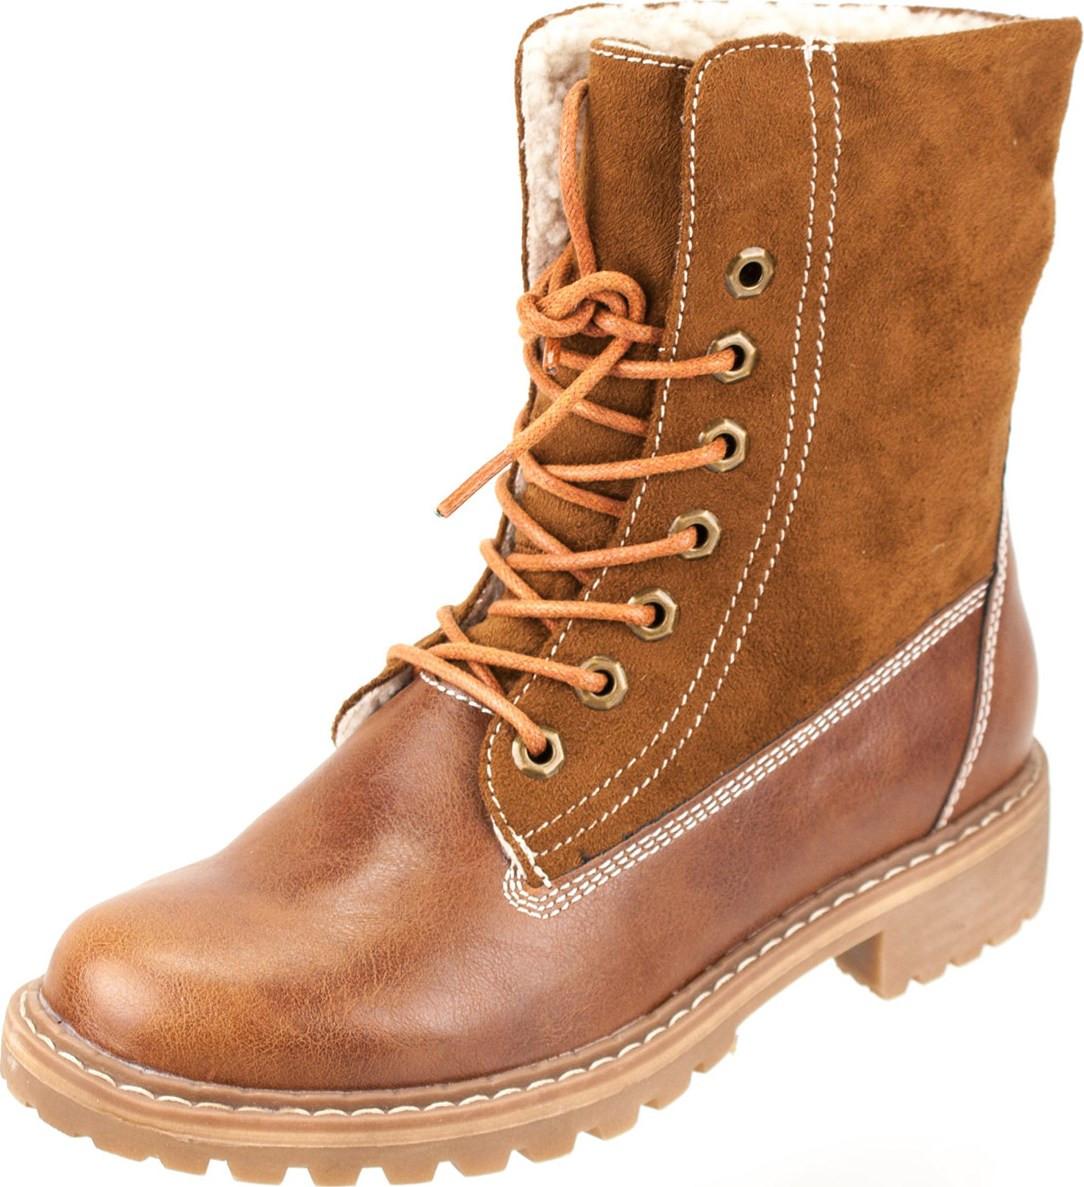 camel παπουτσια - Γυναικεία Μποτάκια Flat  ac58e82ef91